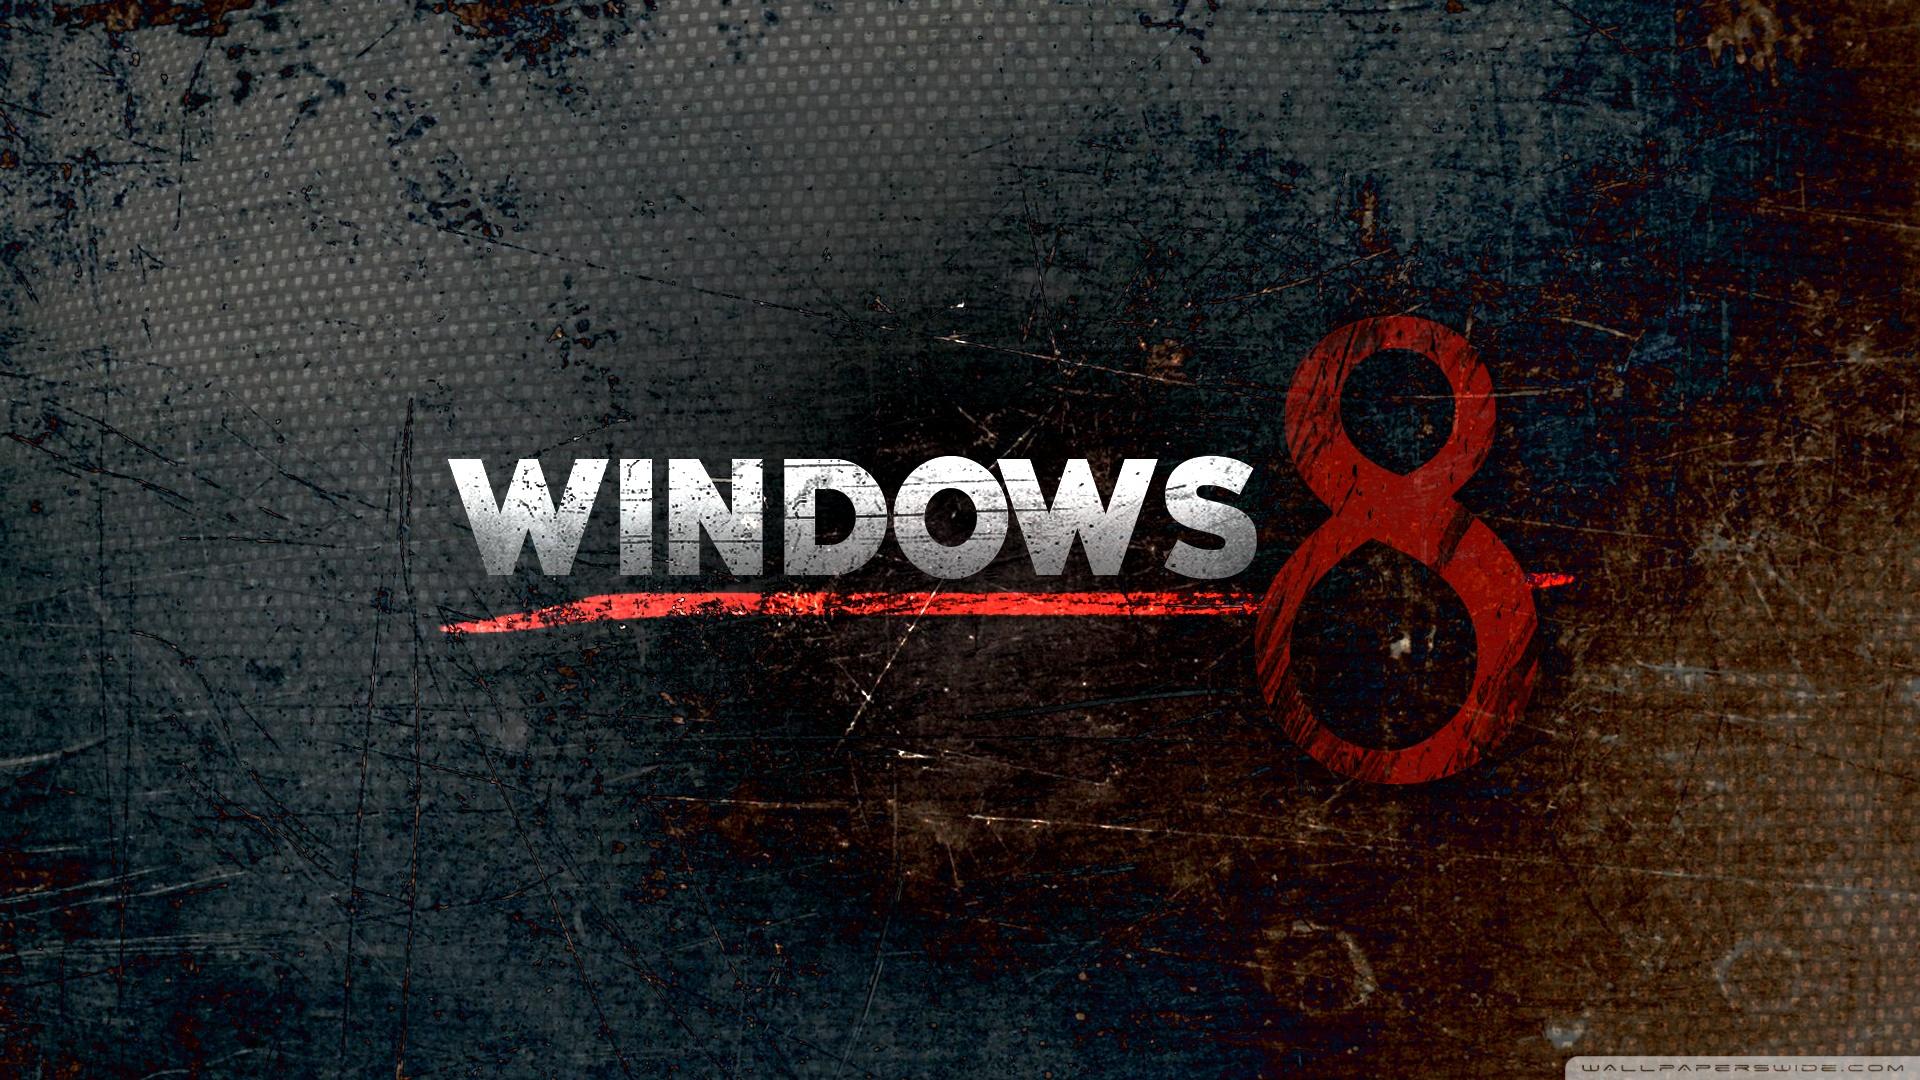 Windows 8 HD HD Wide Wallpaper for Widescreen